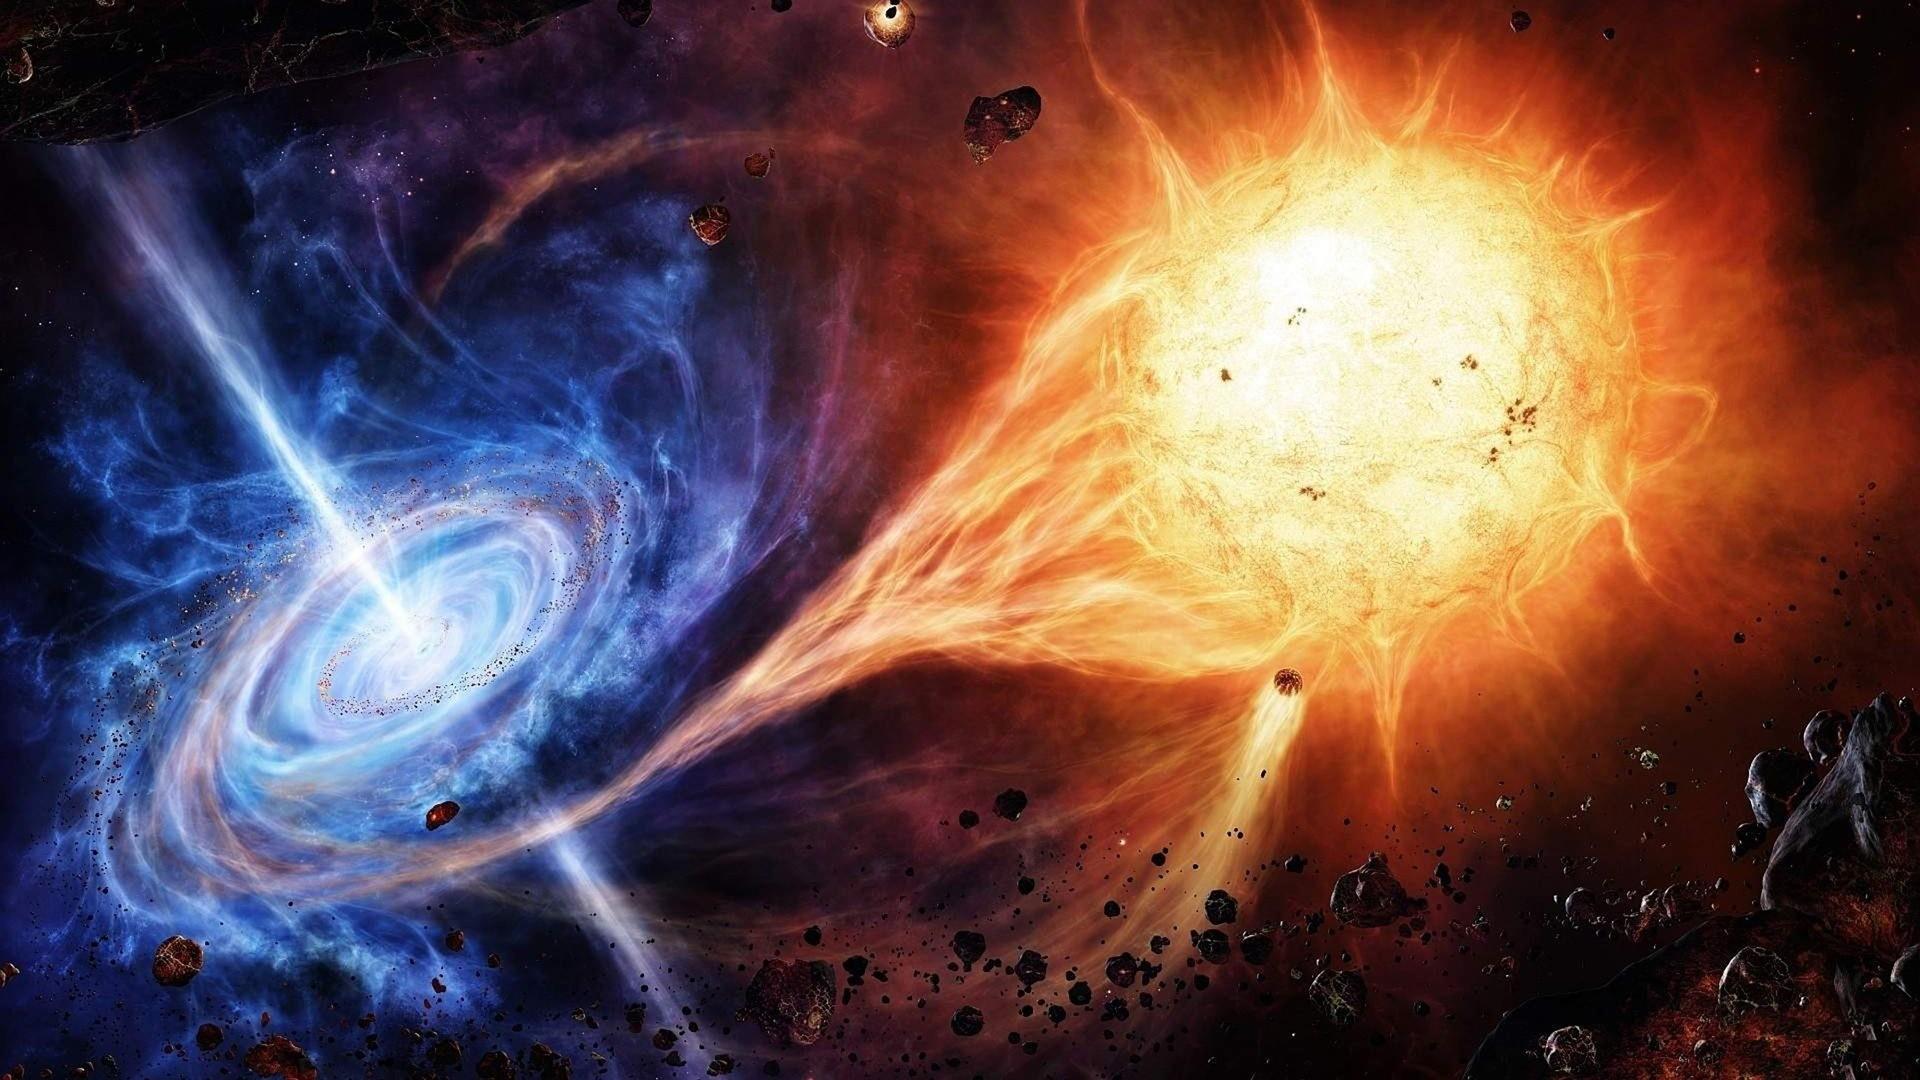 HD Universe Sun Space Wallpaper HD 1080p Full Size .